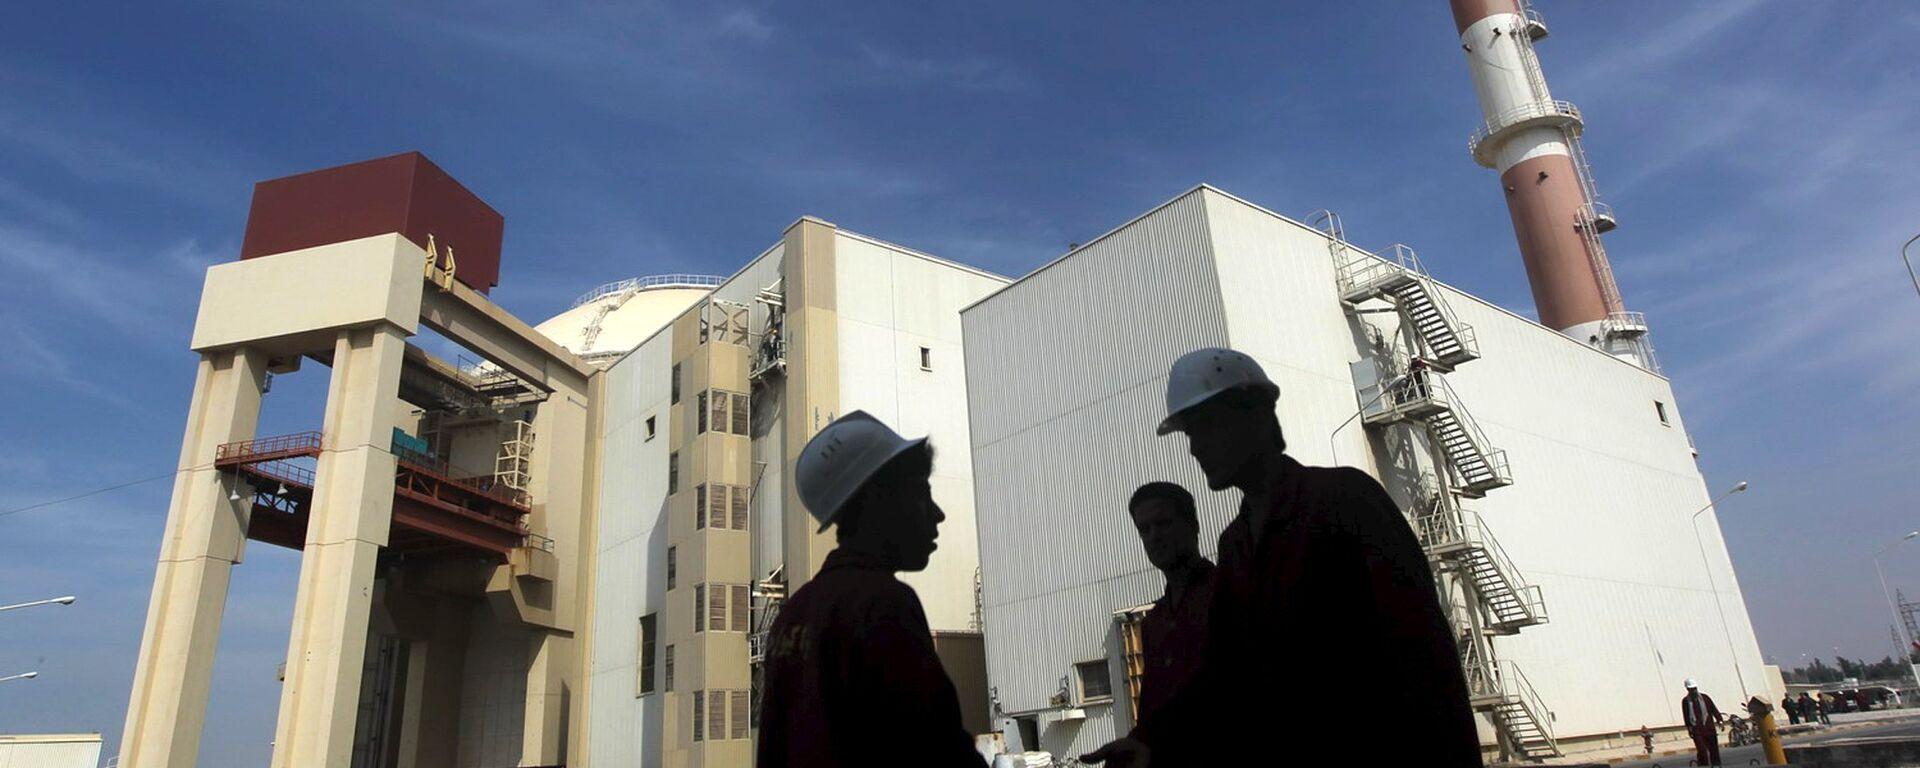 La central nuclear de Bushehr en Irán - Sputnik Mundo, 1920, 07.07.2021